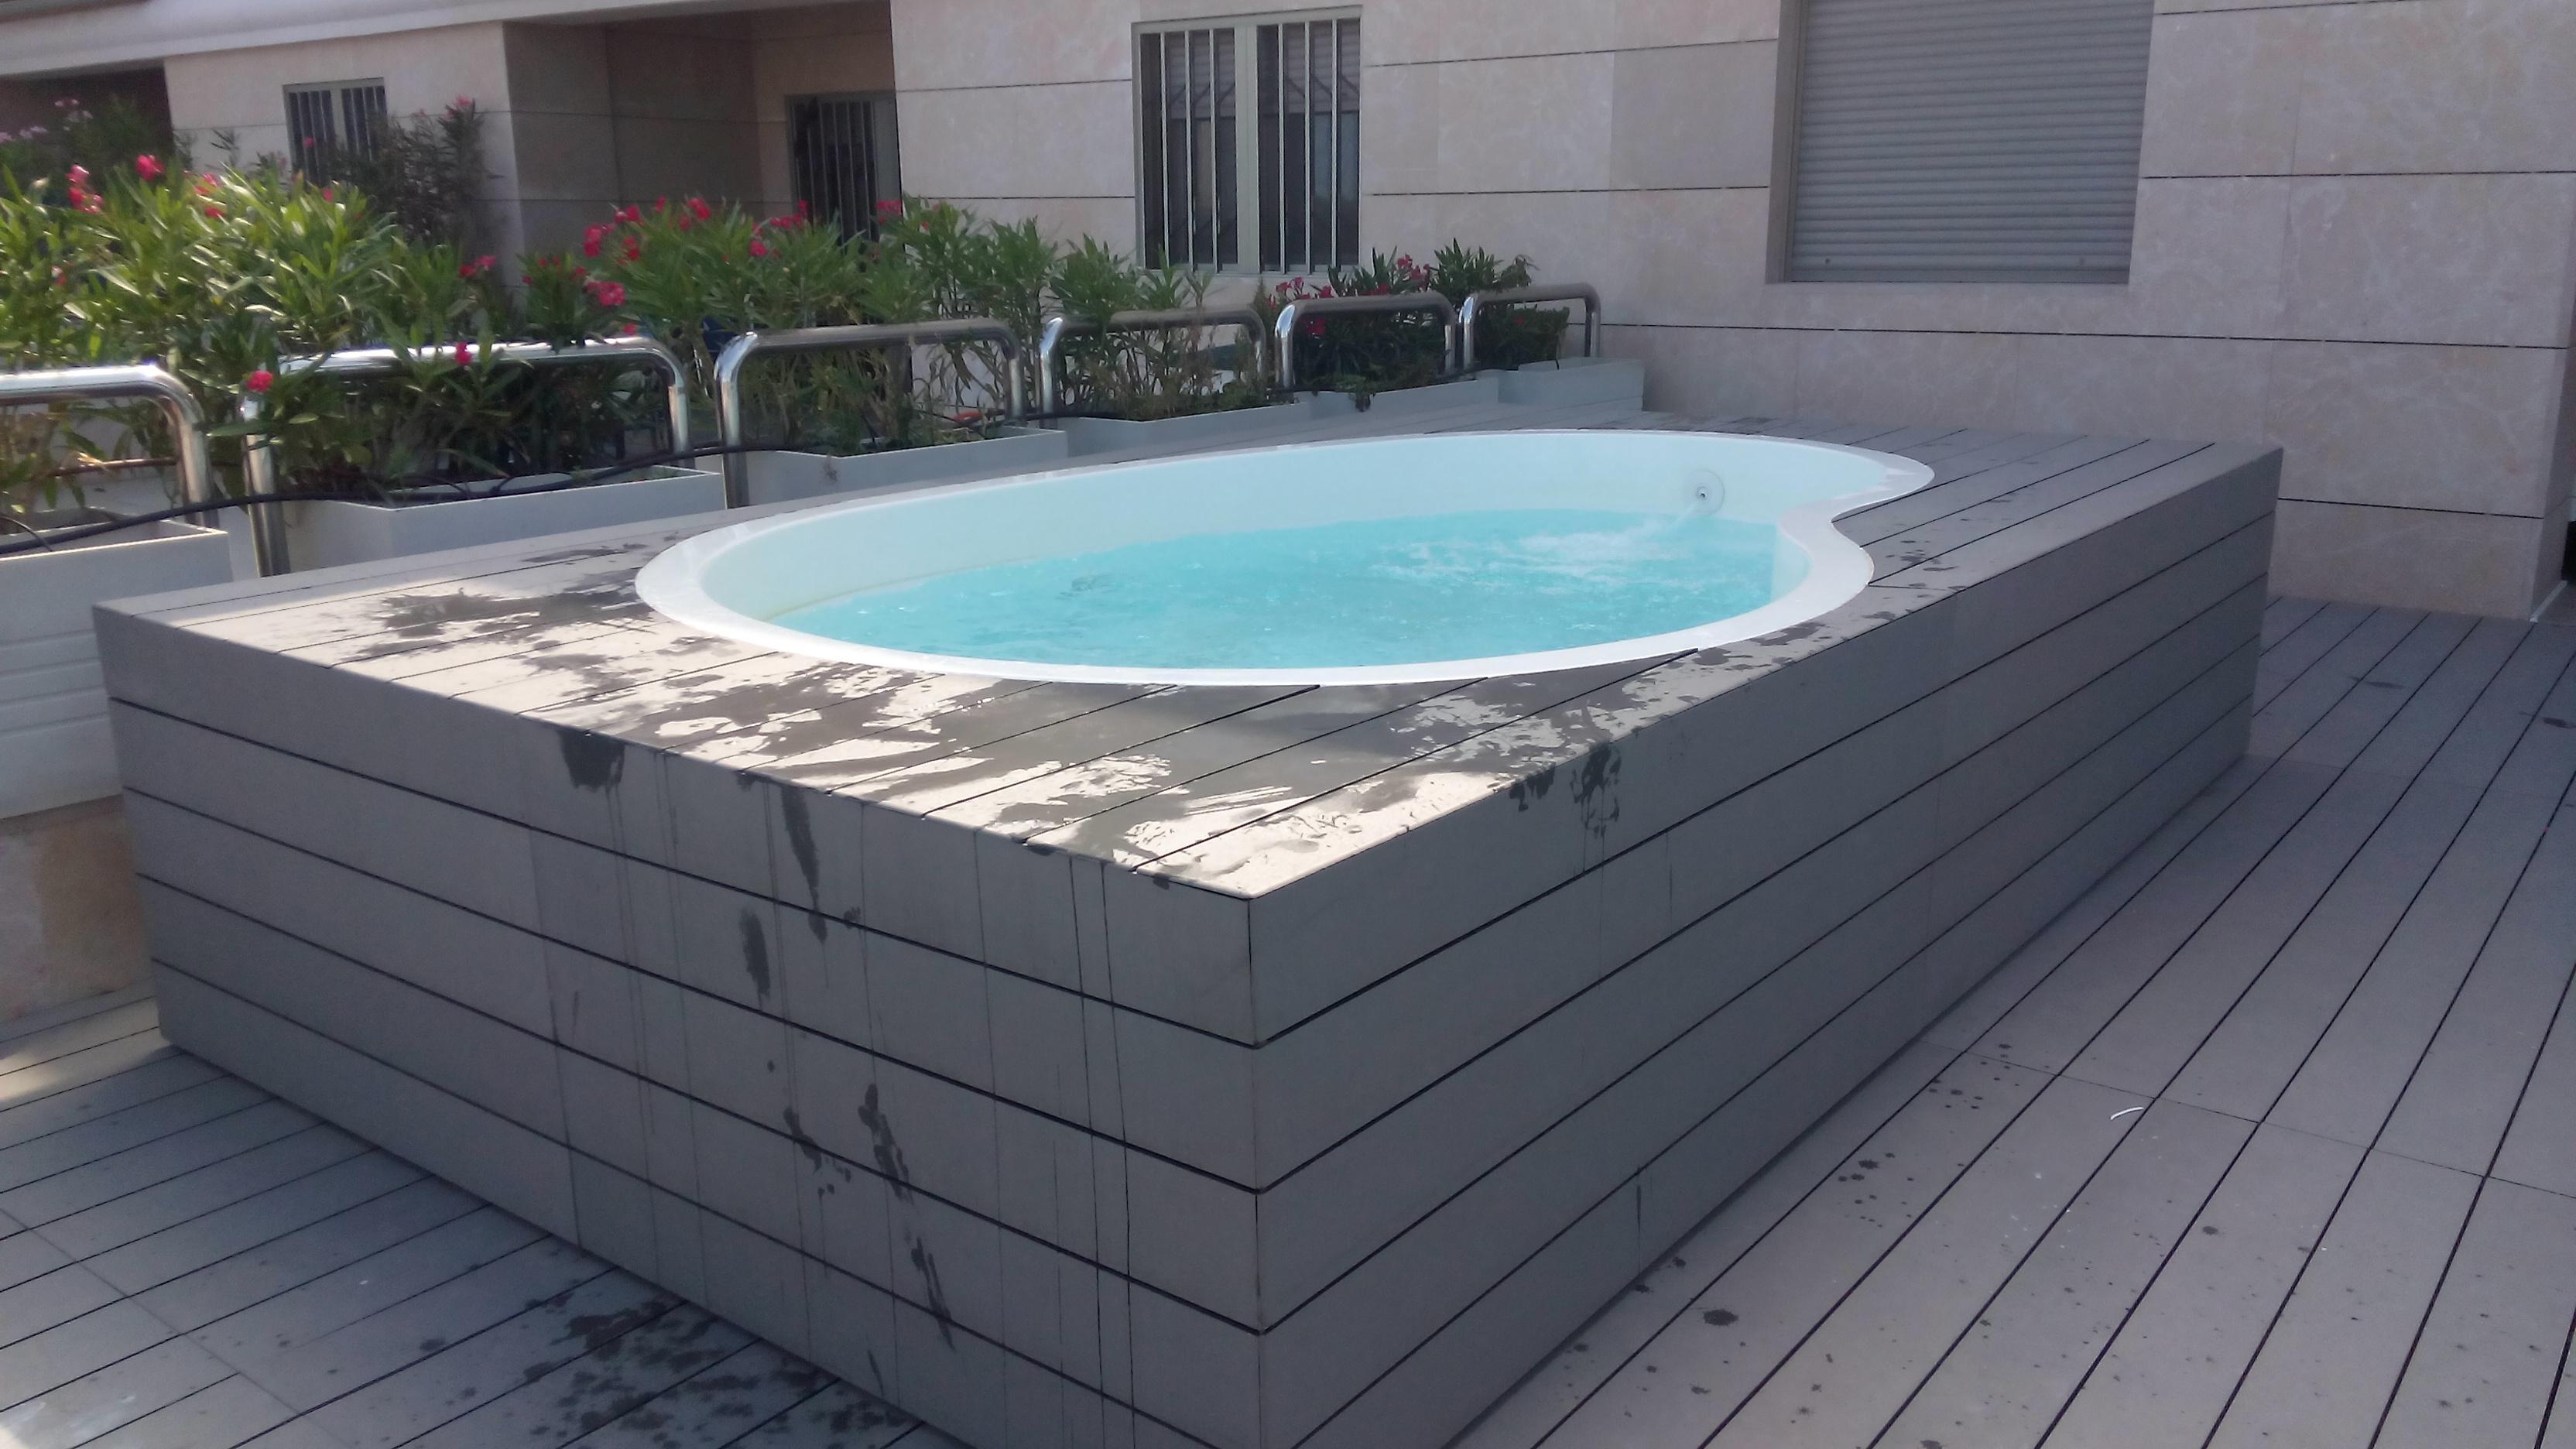 Piscinas obra precios cheap como hacer piscina de obra - Piscina prefabricada precio ...